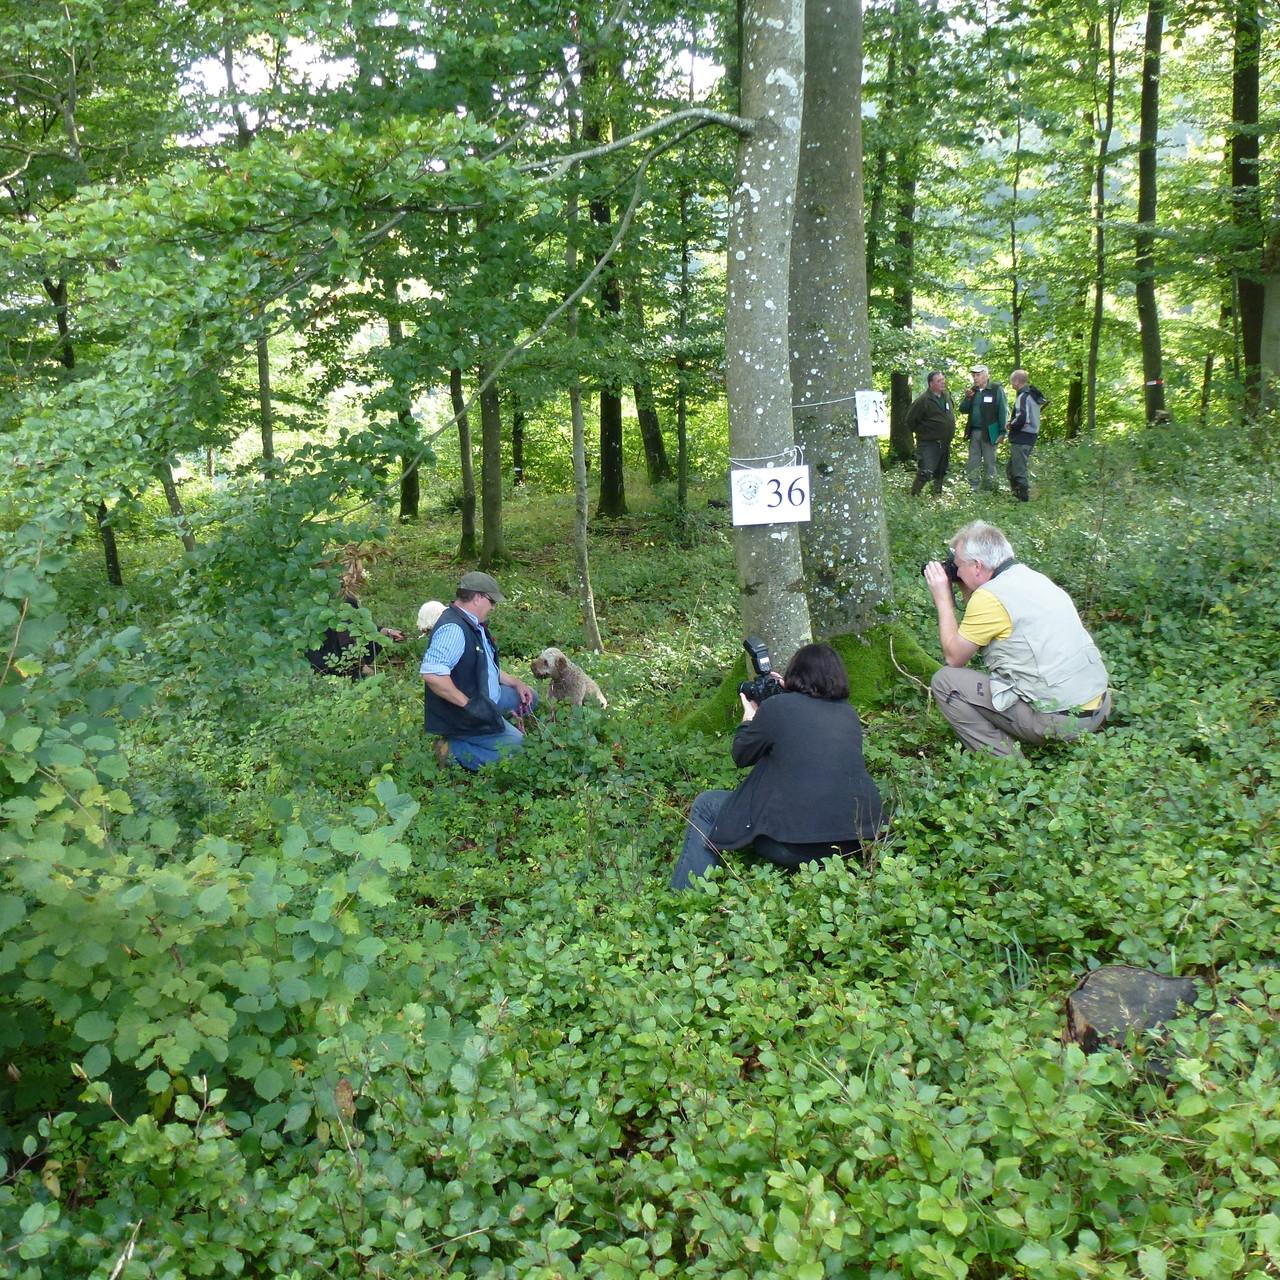 Finale an der Trüffelsuchprüfung in Gansingen 2012